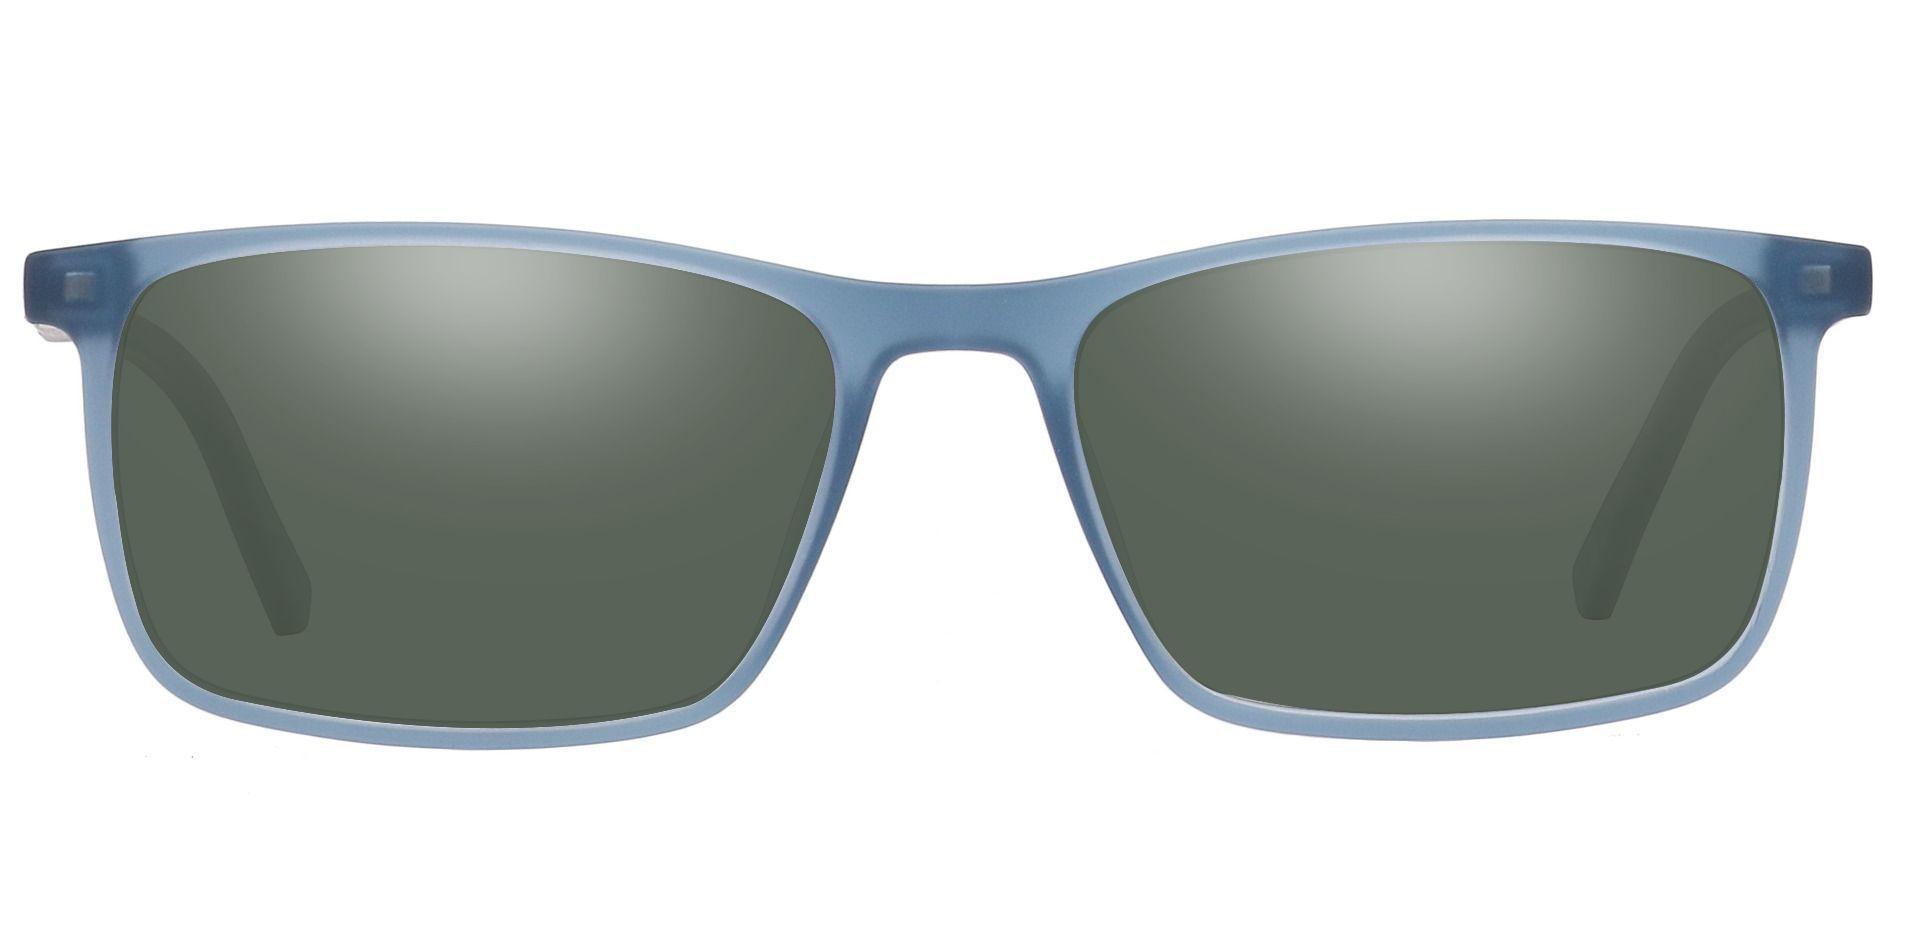 Helga Rectangle Prescription Sunglasses - Blue Frame With Green Lenses